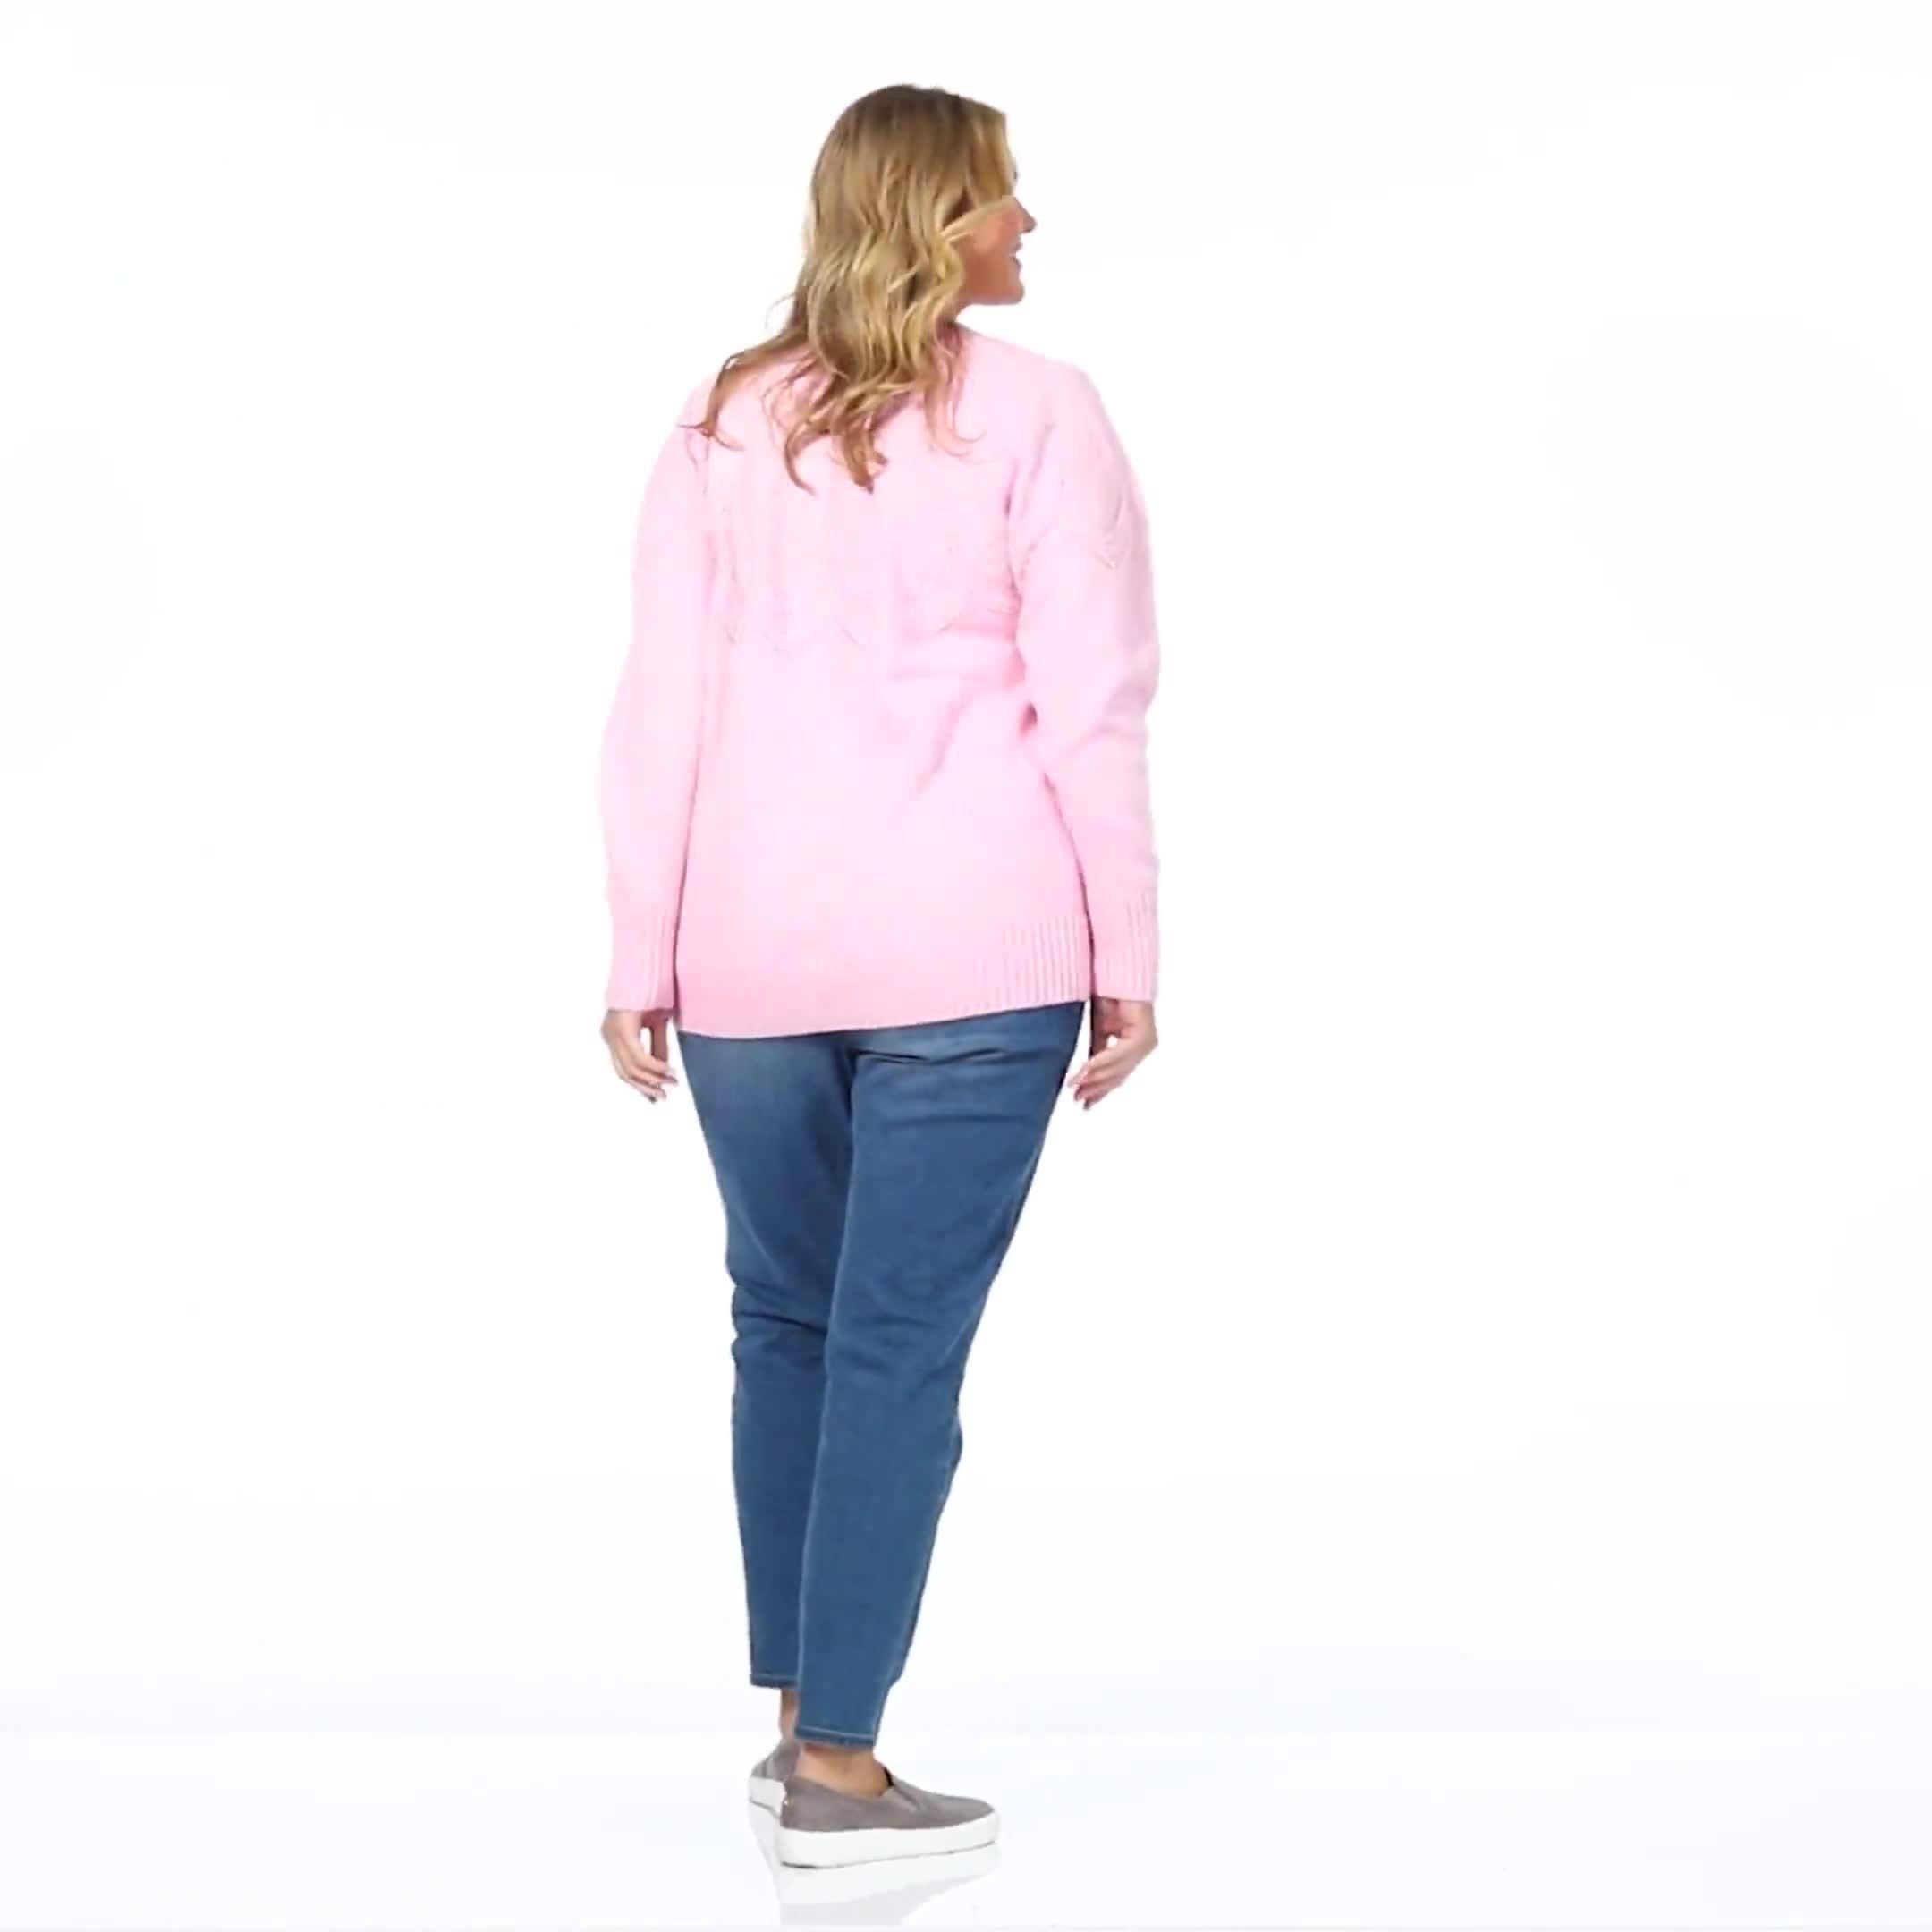 Roz & Ali Pointelle Pullover Sweater - Plus - Video